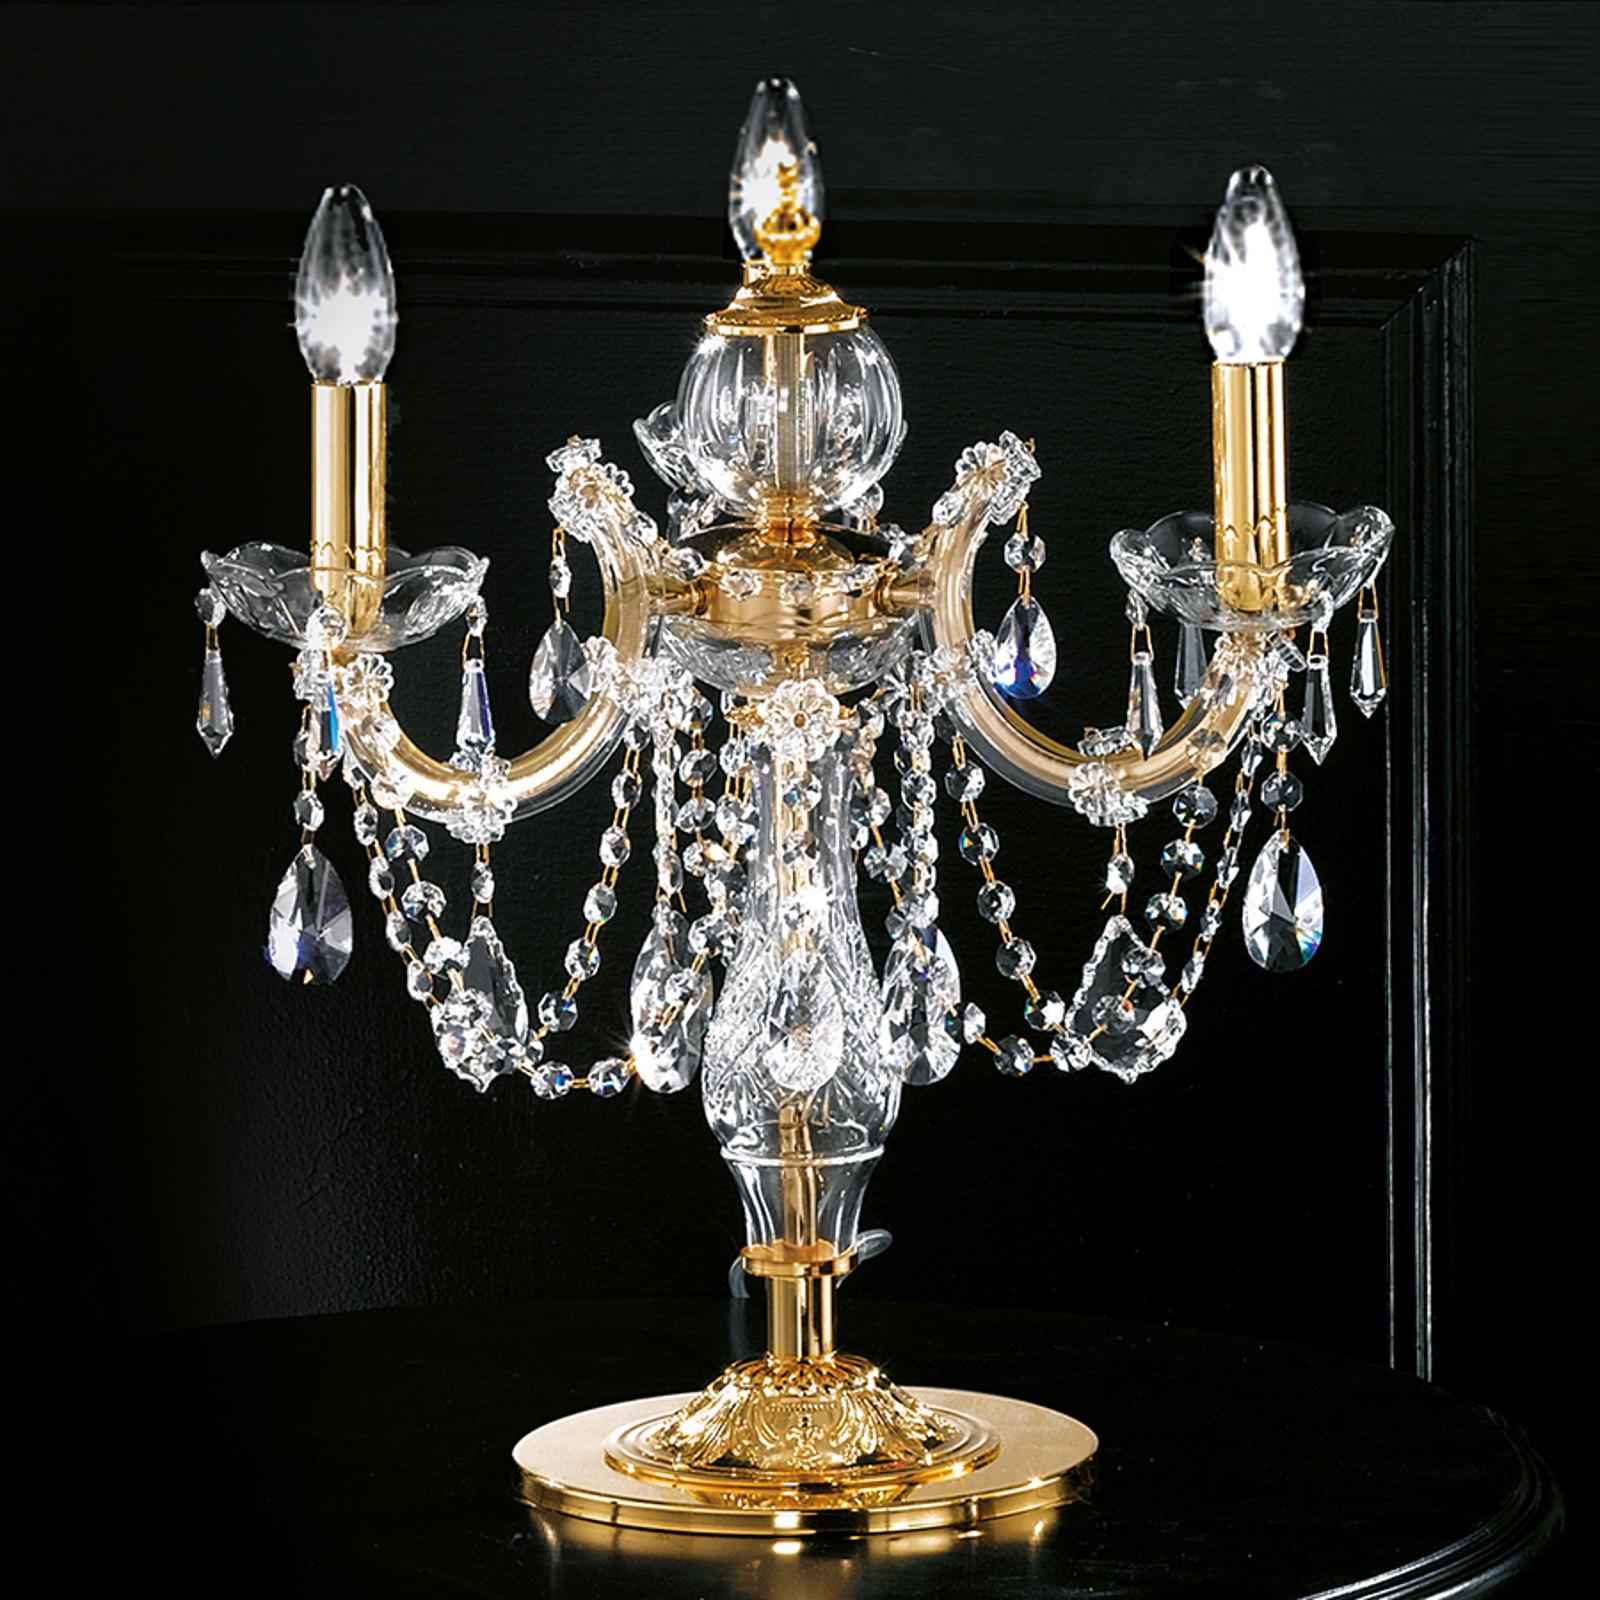 Bordlampe Maria Teresa med tre lyskilder